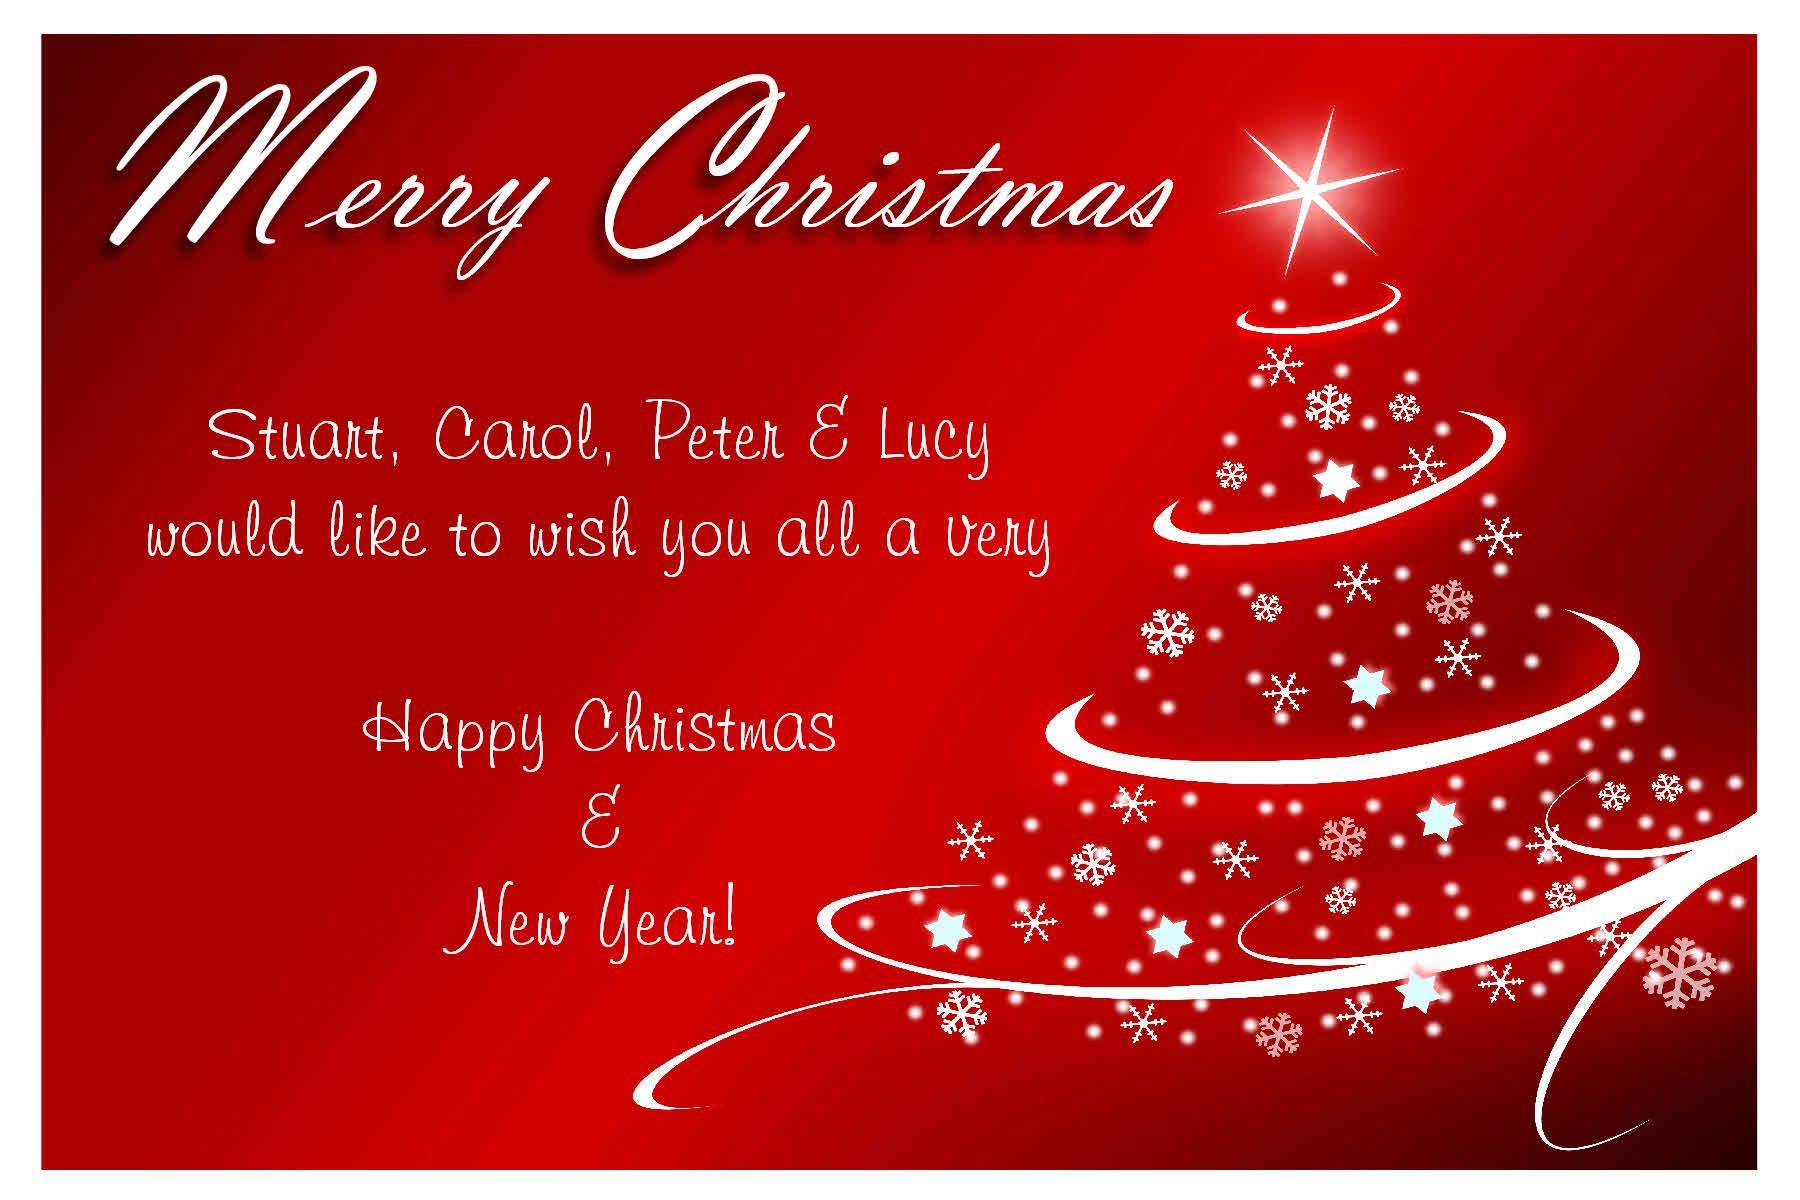 Merry Xmas 2014 Greeting Cards | Merry Christmas | Pinterest ...